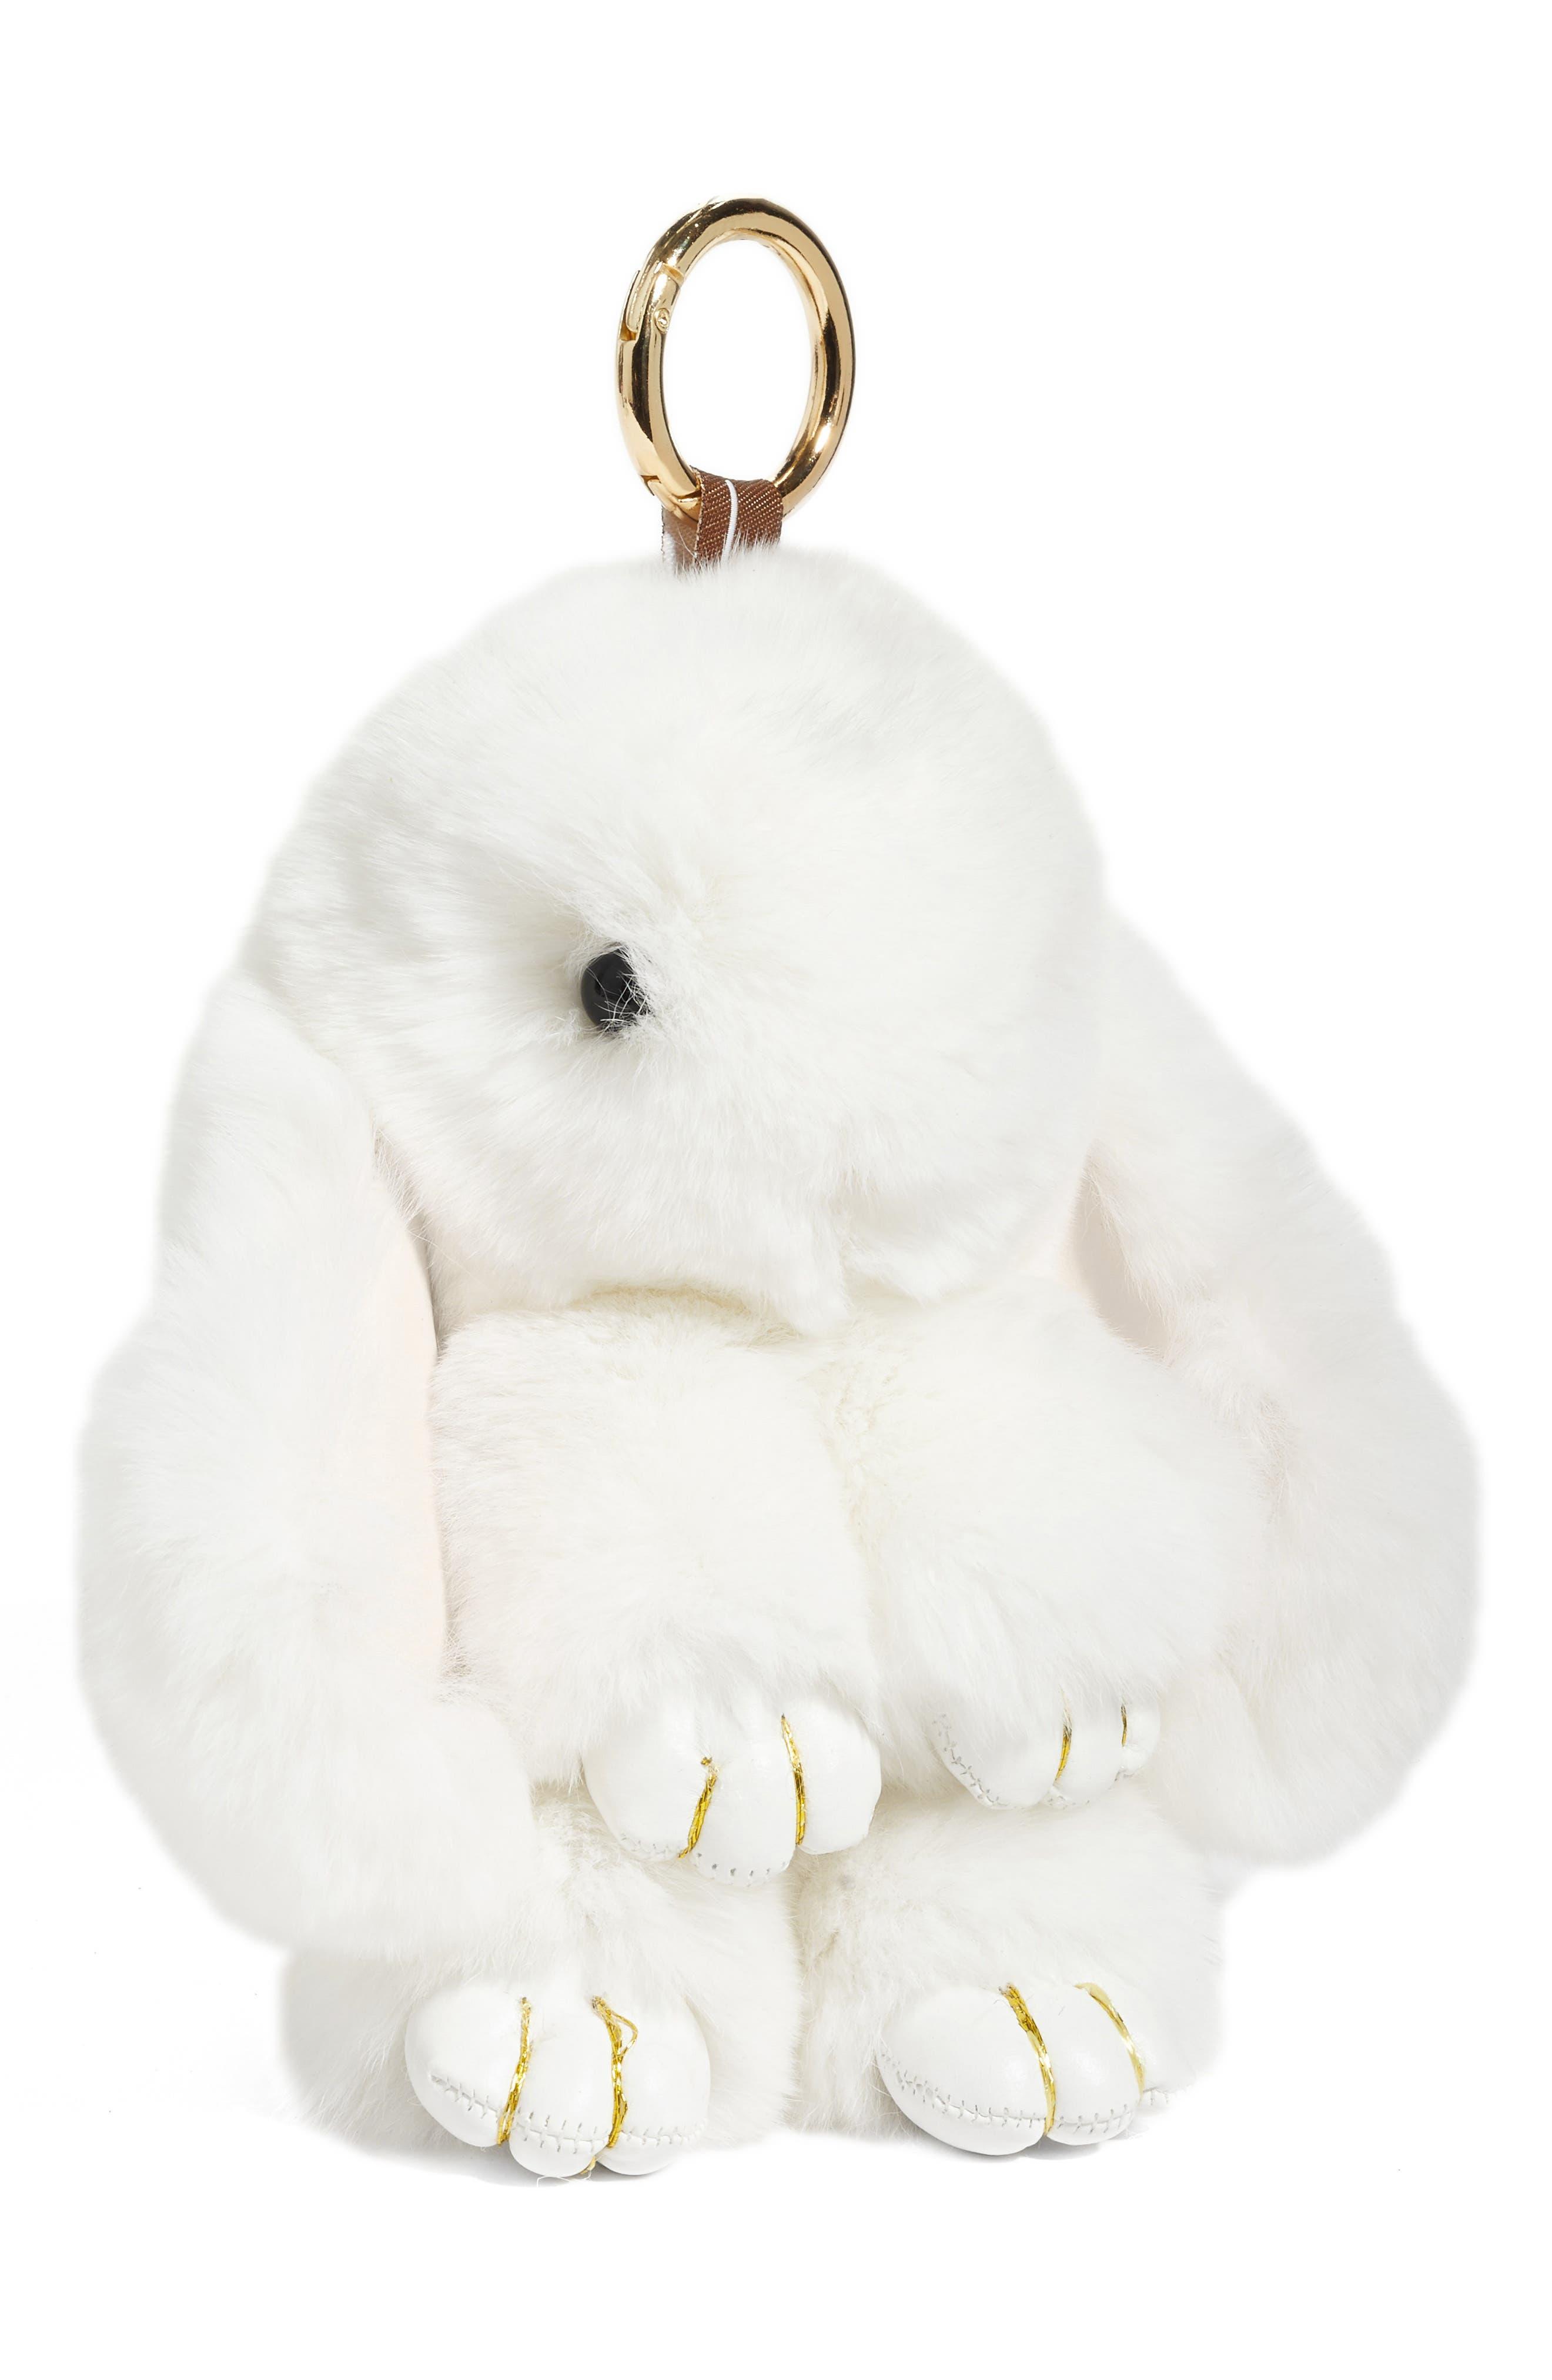 Natasha Couture Genuine Rabbit Fur Bag Charm,                         Main,                         color, White